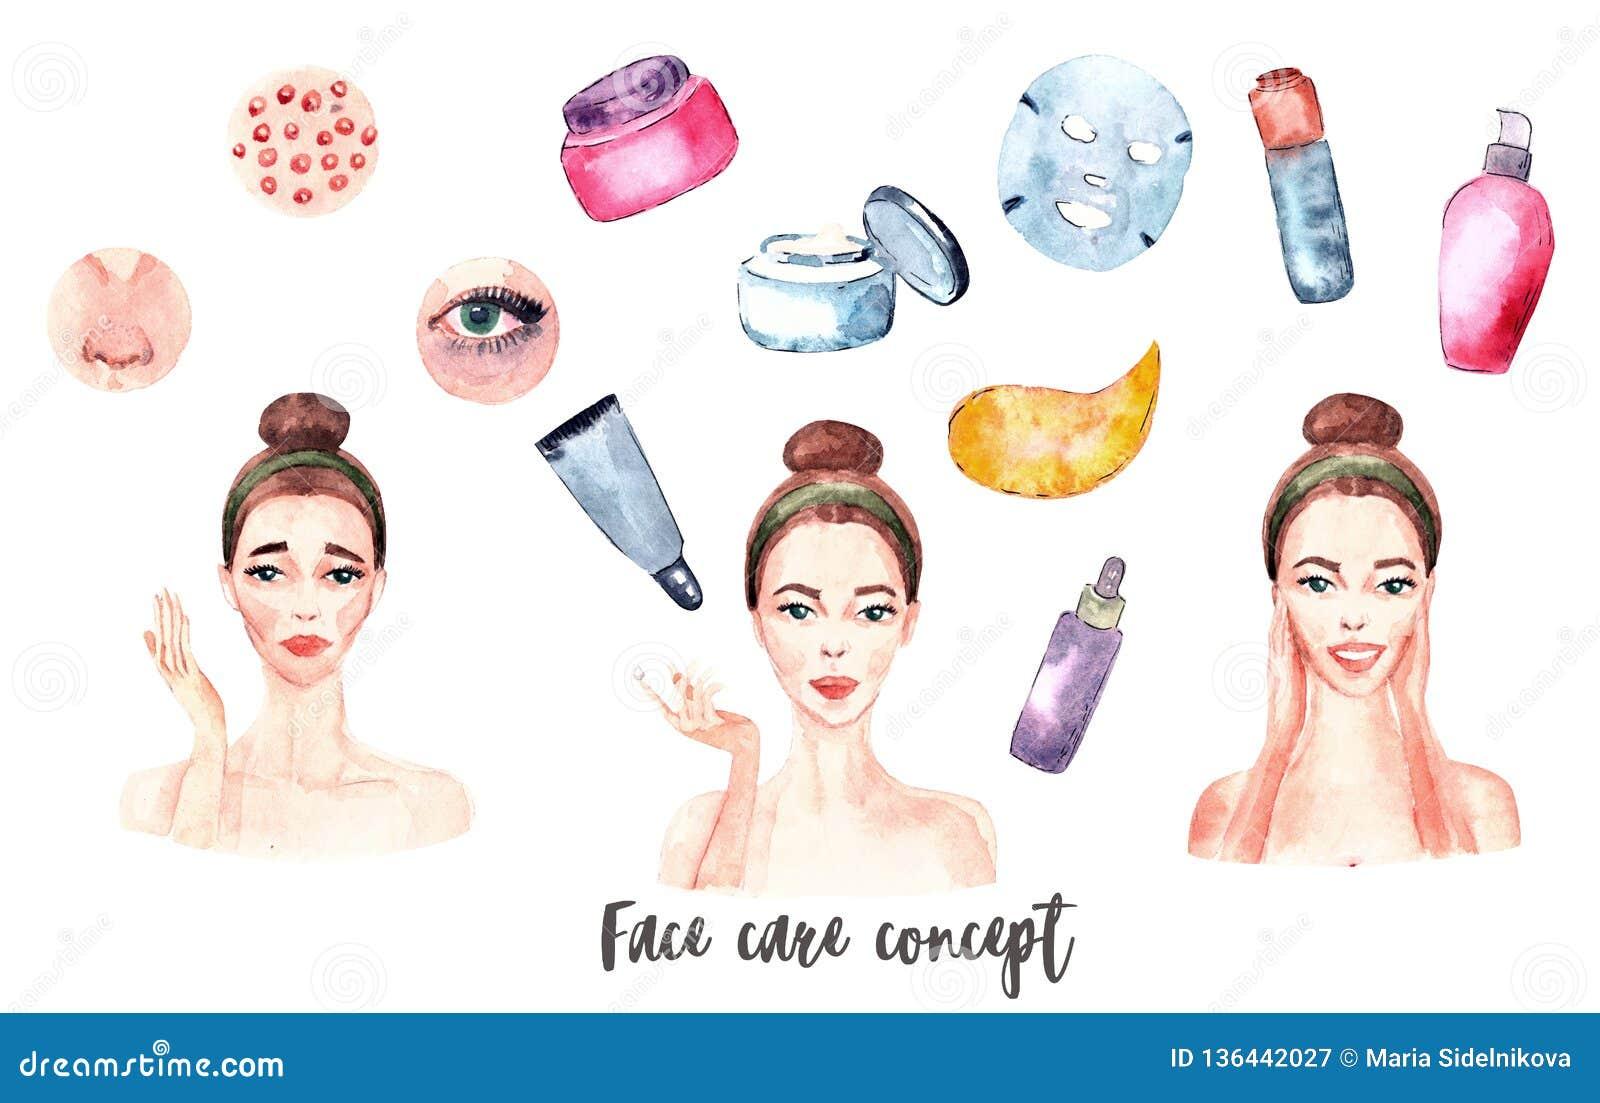 Banner Watercolor Acne Pimples Wrinkles Dry Skin Blackheads Dark Circles Under Eyes Stock Illustration Illustration Of Oils Cosmetics 136442027